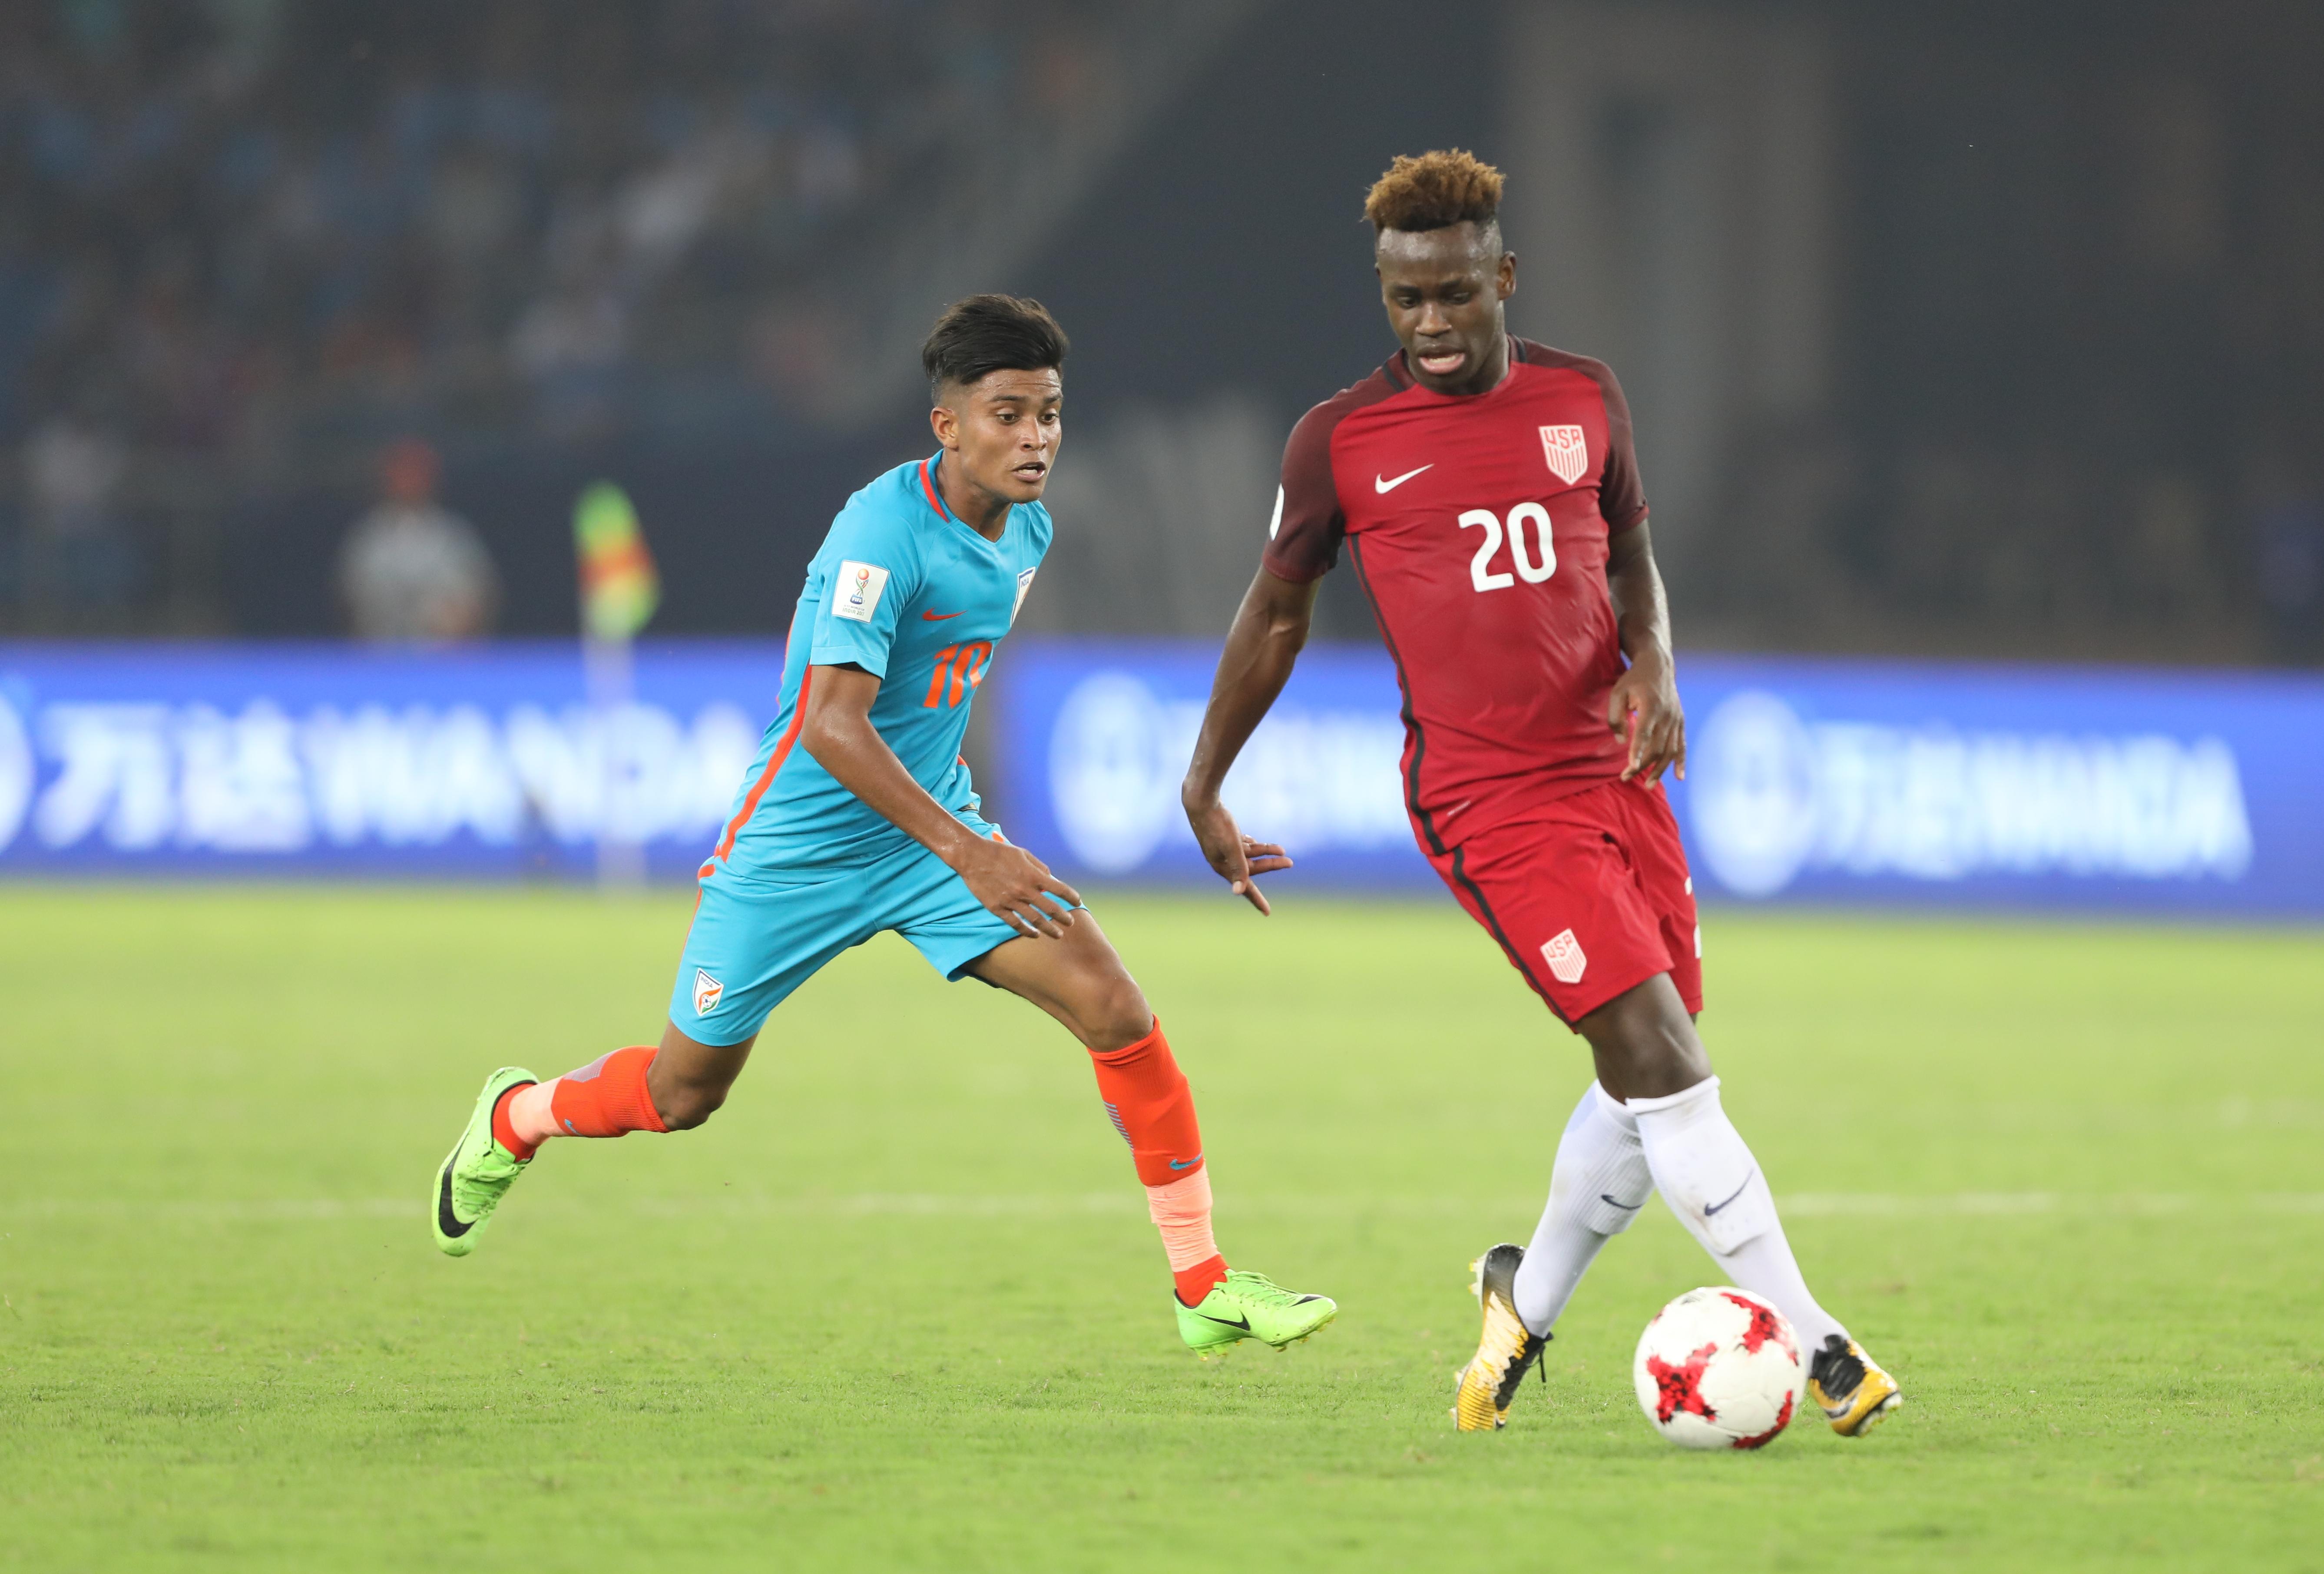 Abhijit Sarkar Chris Goslin India U17 USA U17 2017 U17 World Cup